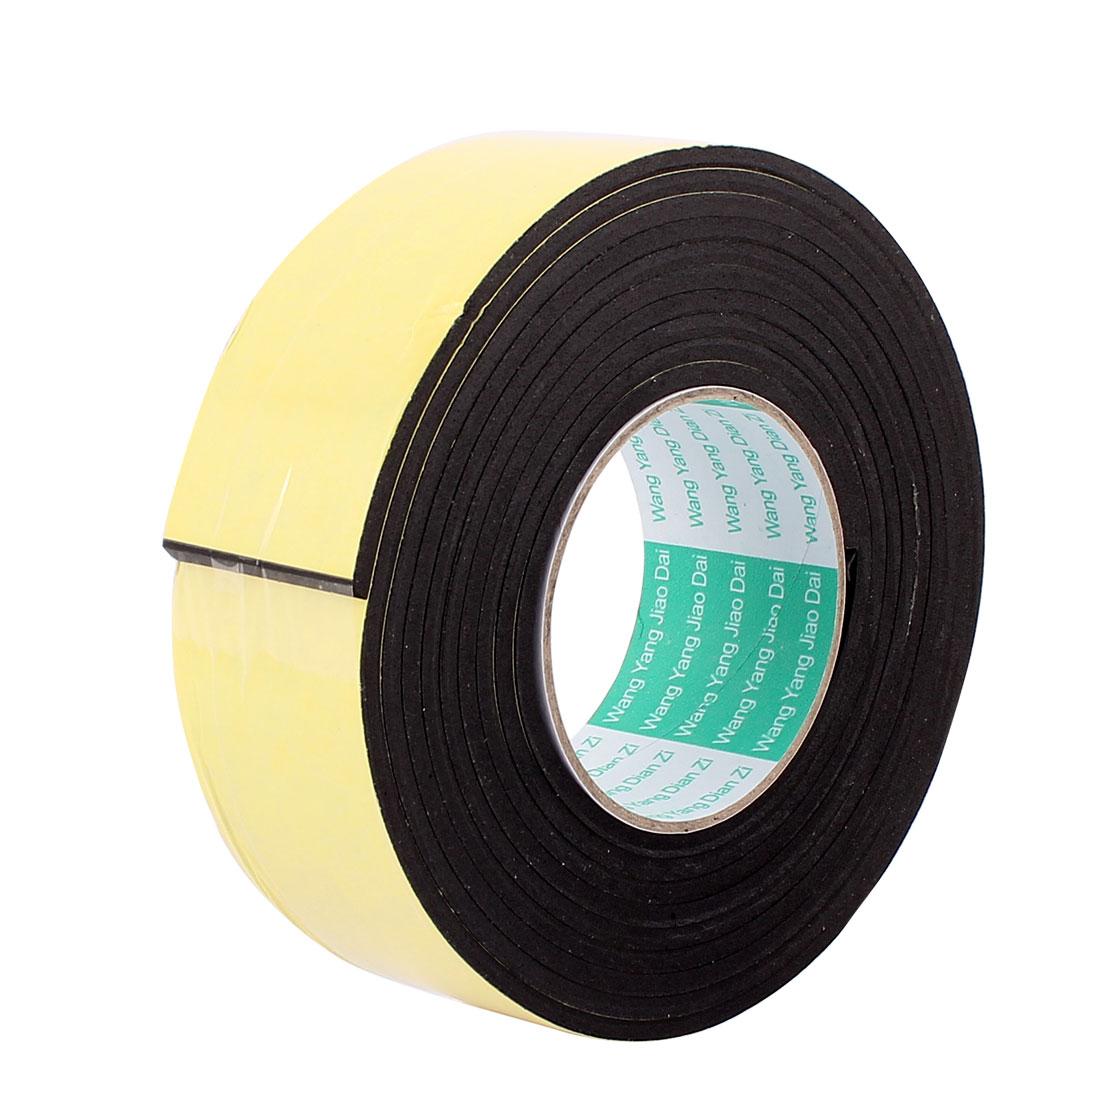 50mmx4mm Single Sided Sponge Tape Adhesive Sticker Foam Glue Strip Sealing 3 Meters 10Ft